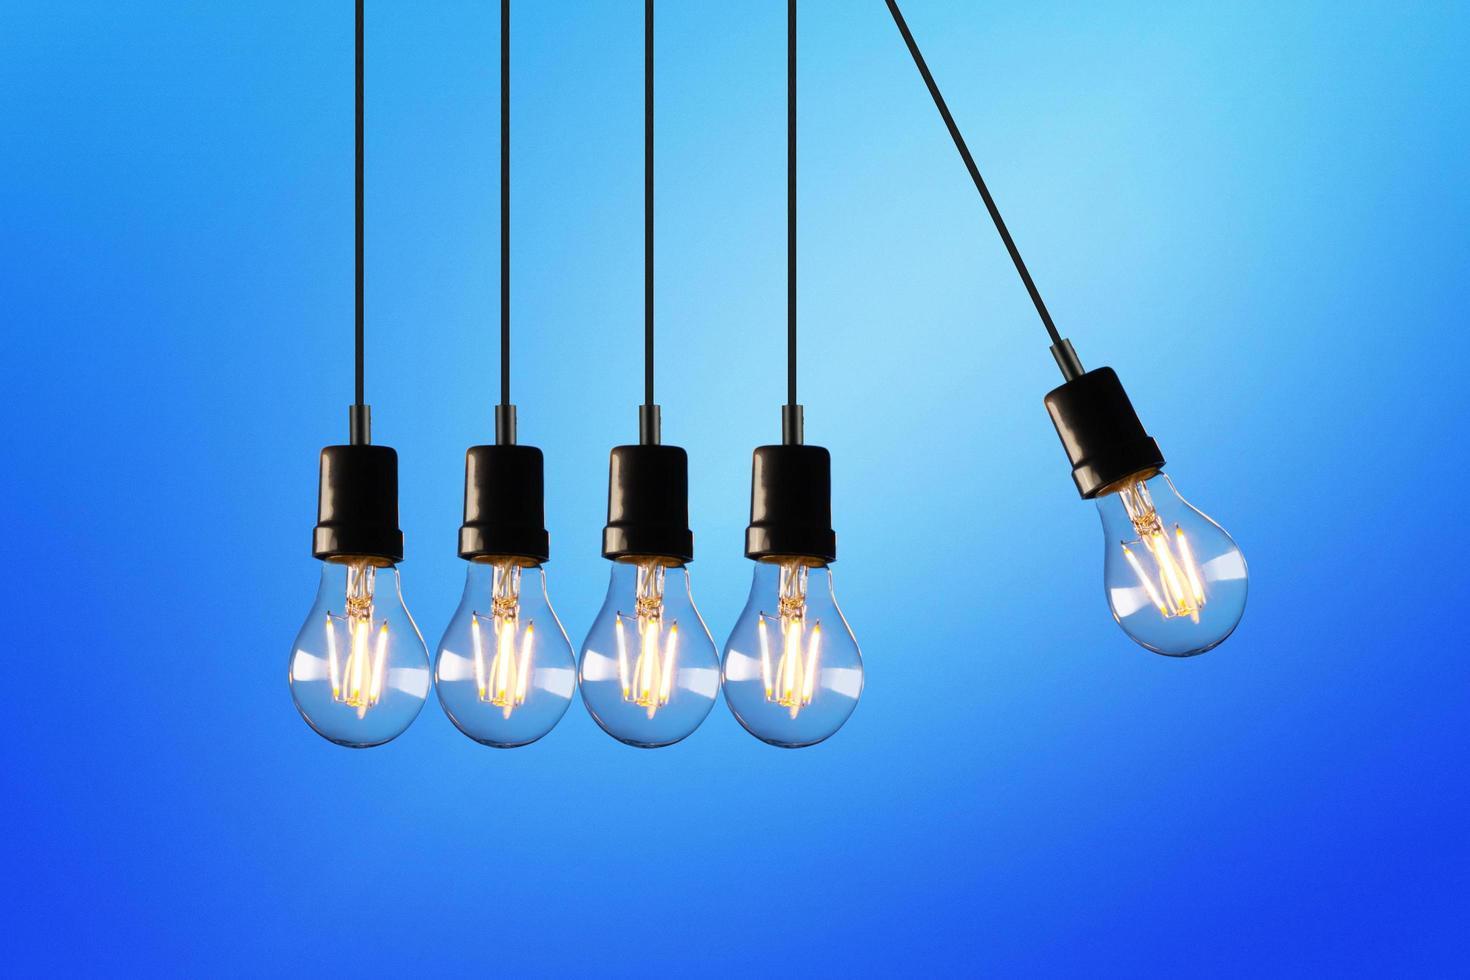 Five light bulbs photo